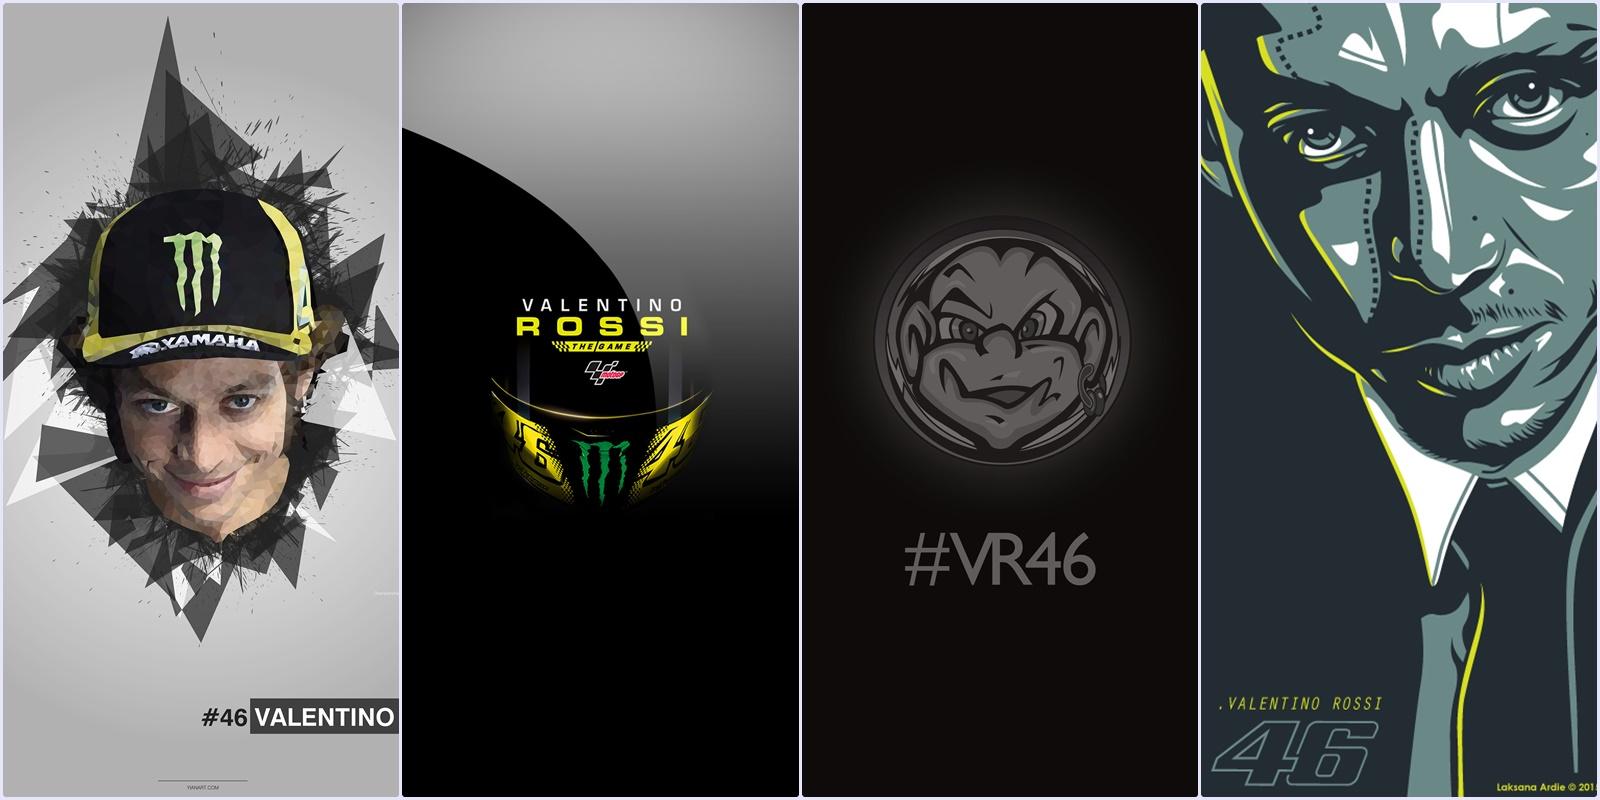 Vr46 iphone wallpaper - Amazing Valentino Rossi Wallpaper